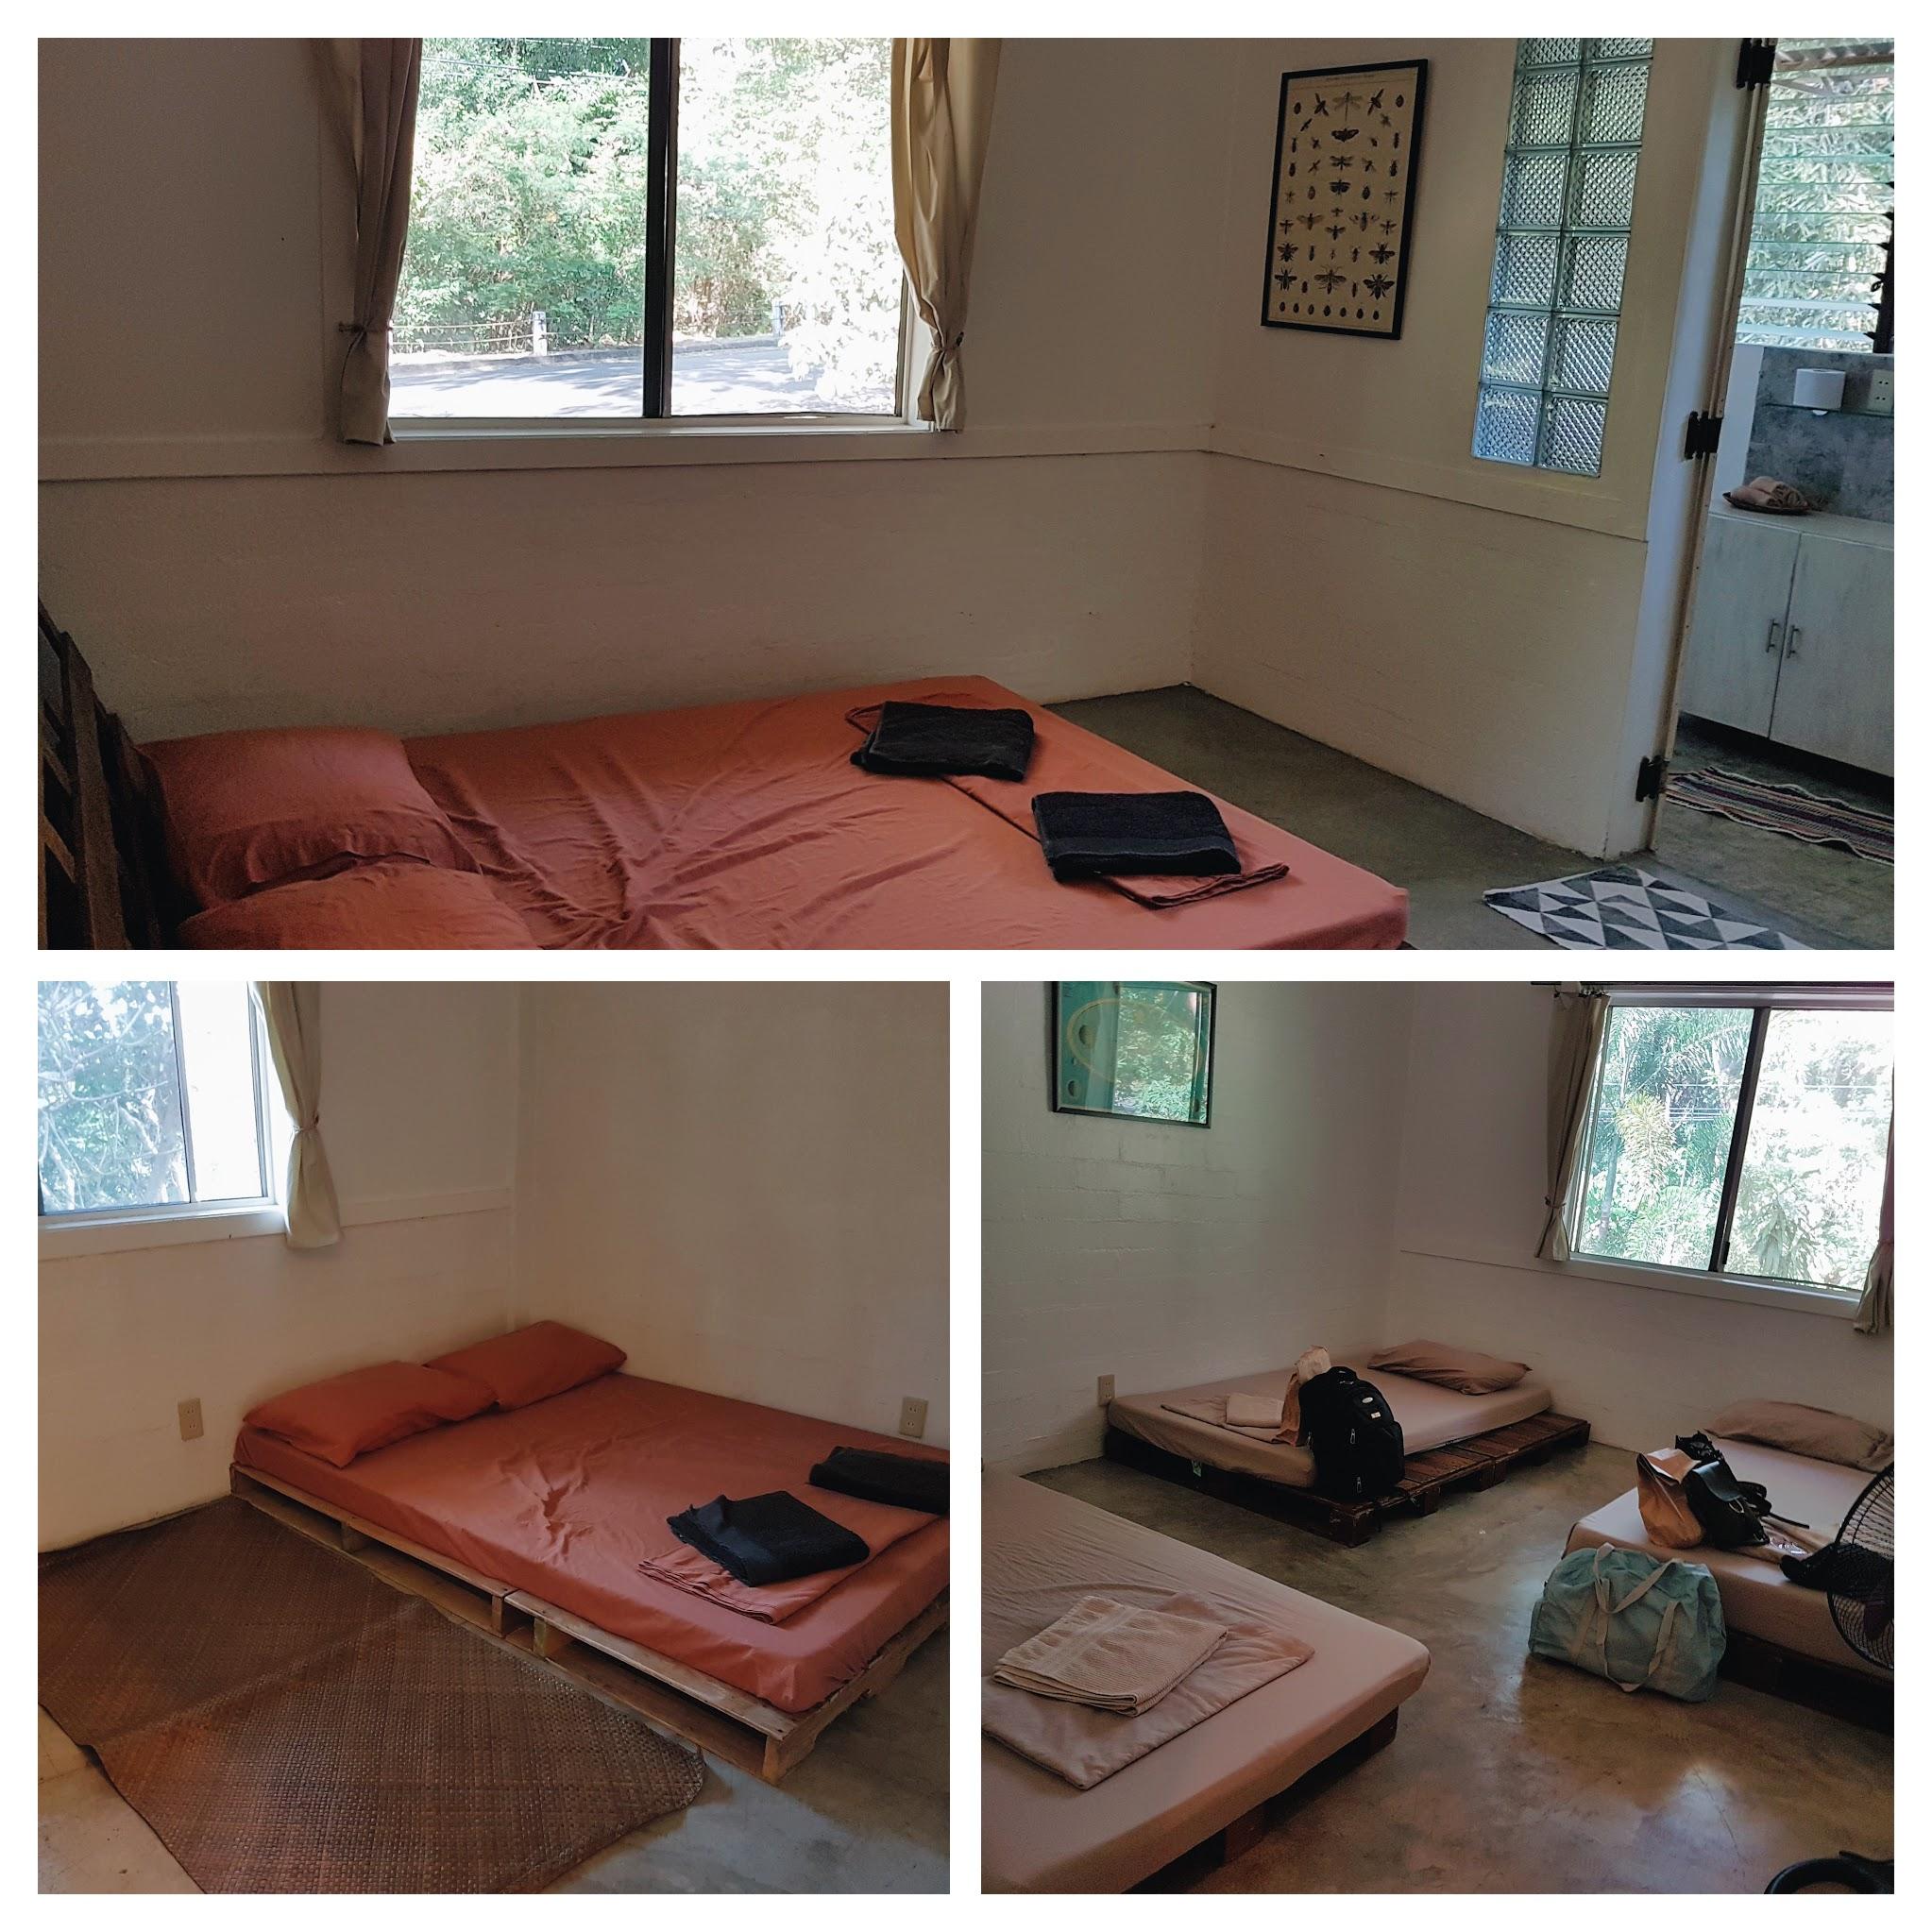 Airbnb Review: Subic Rainforest Retreat - 3 rooms | www.wearejuanderers.com